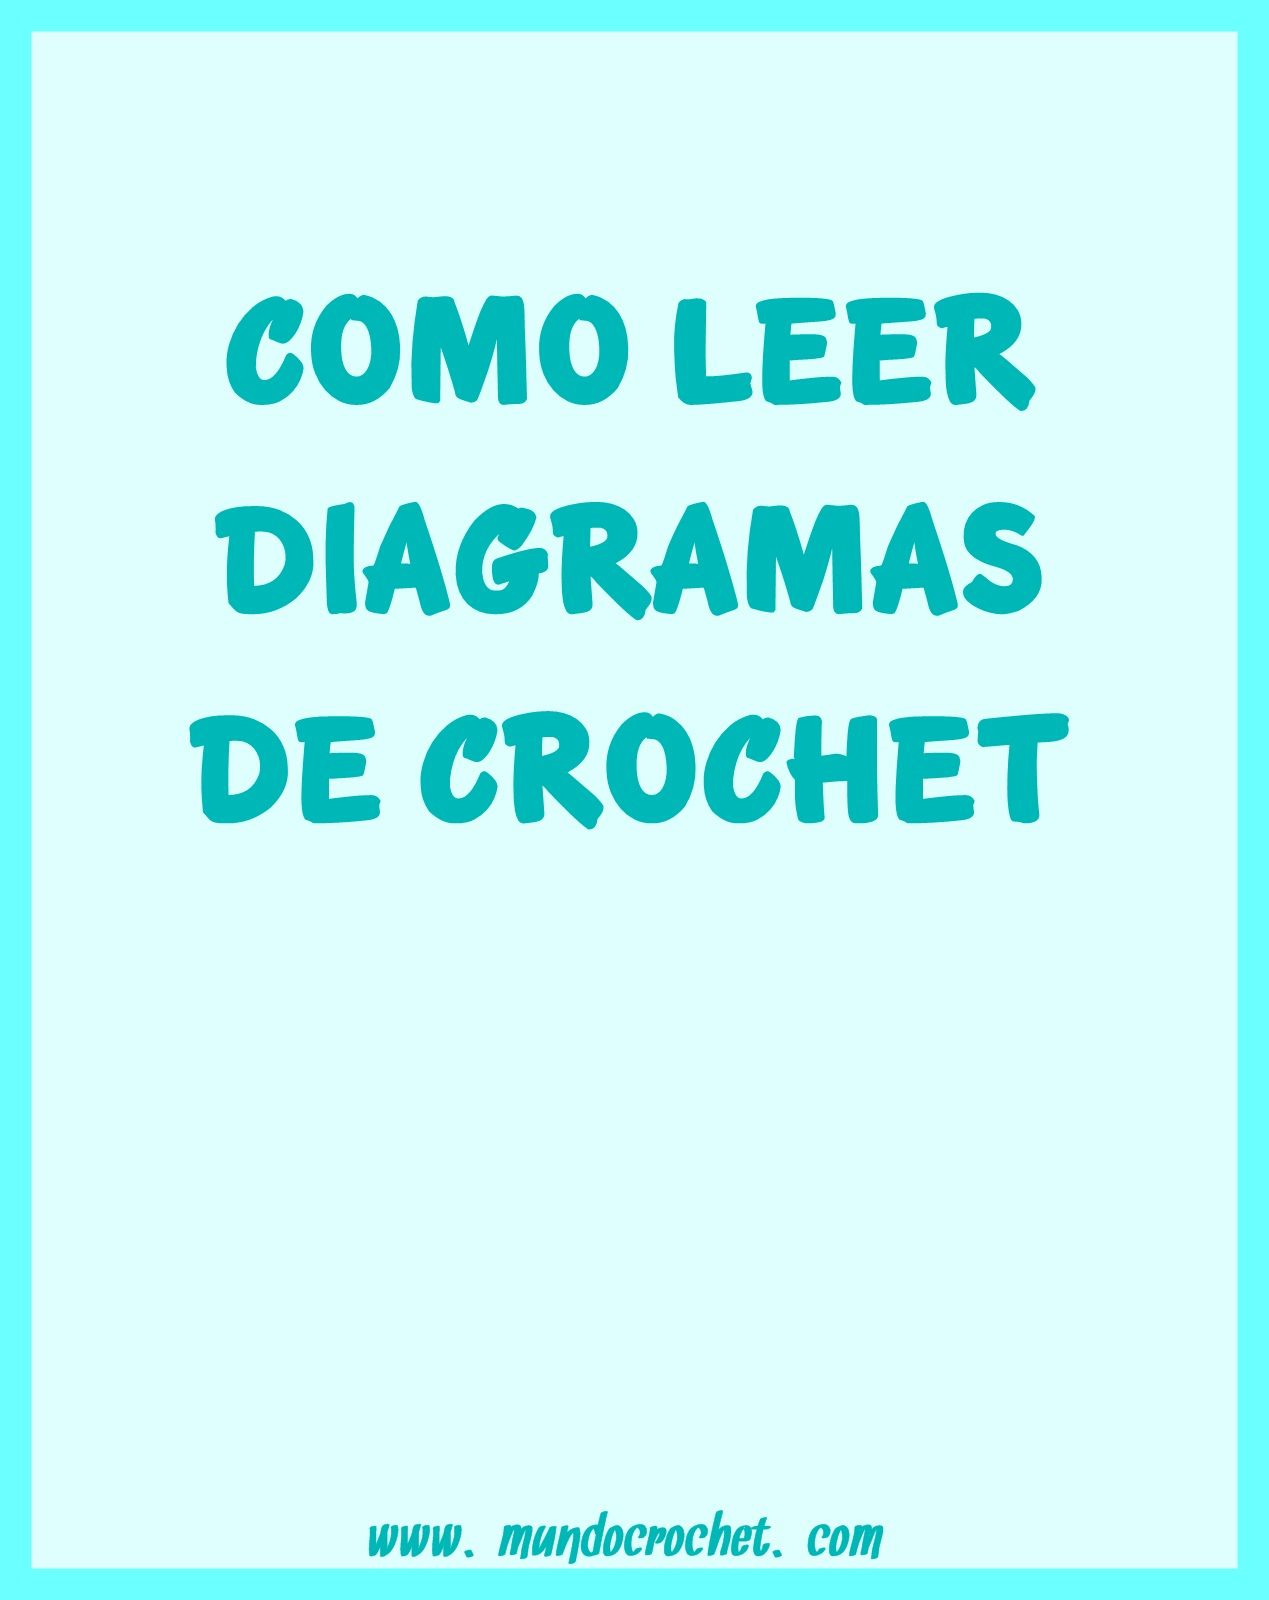 Cómo leer diagramas de crochet o ganchillo | casa | Pinterest | Leer ...